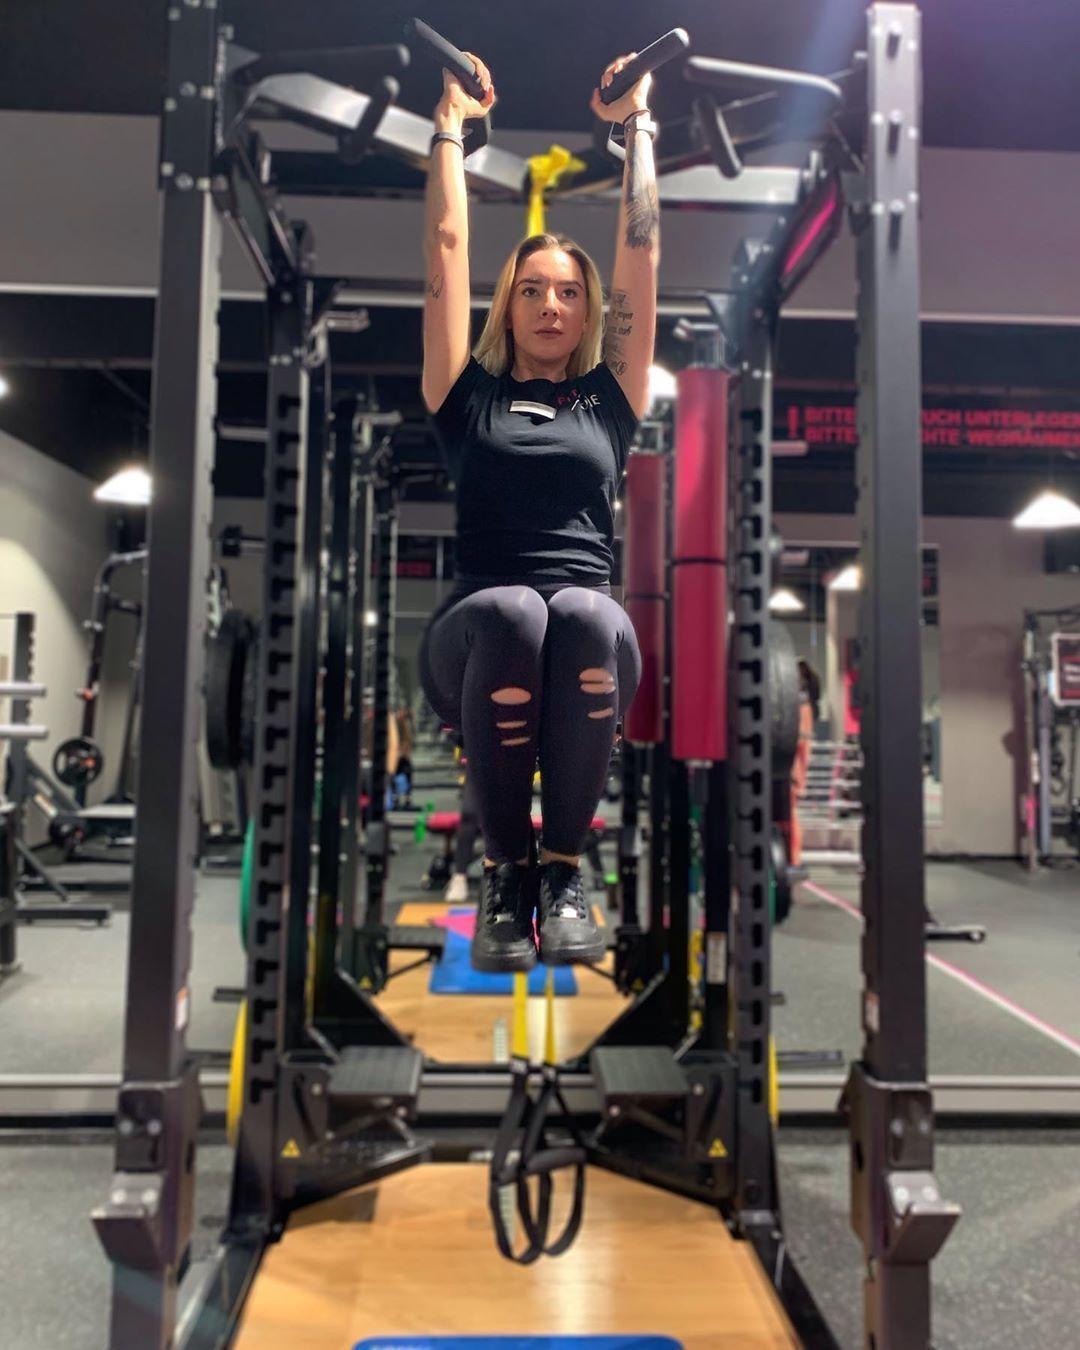 # rumhängen #einfach #fitgi #fitness #FitOne #ladys -  #abhängen #einfach #fitgi #Fitness #FitOne #D...